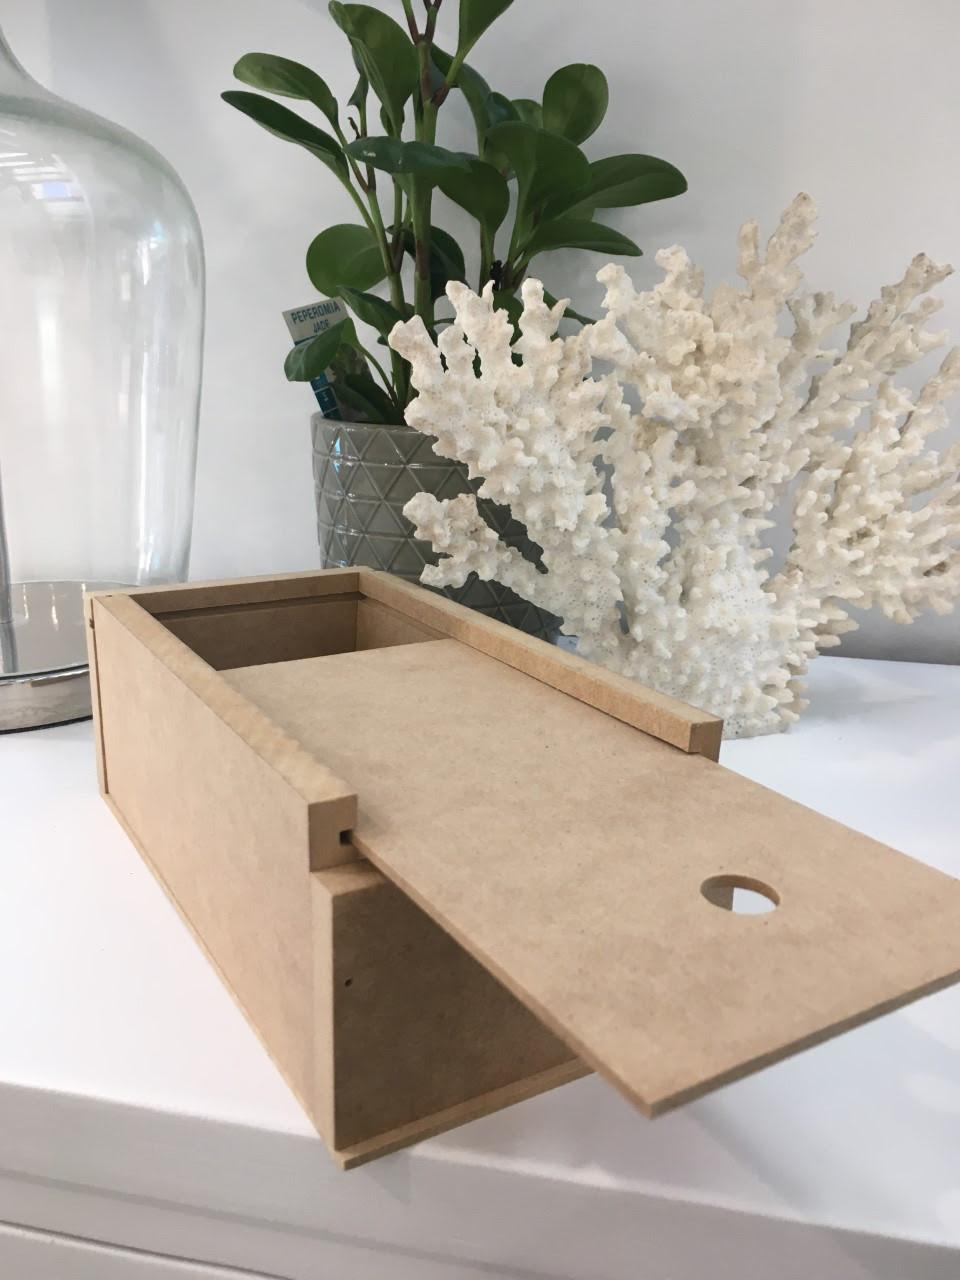 Build By Kidz DIY birthday woodwork party kits